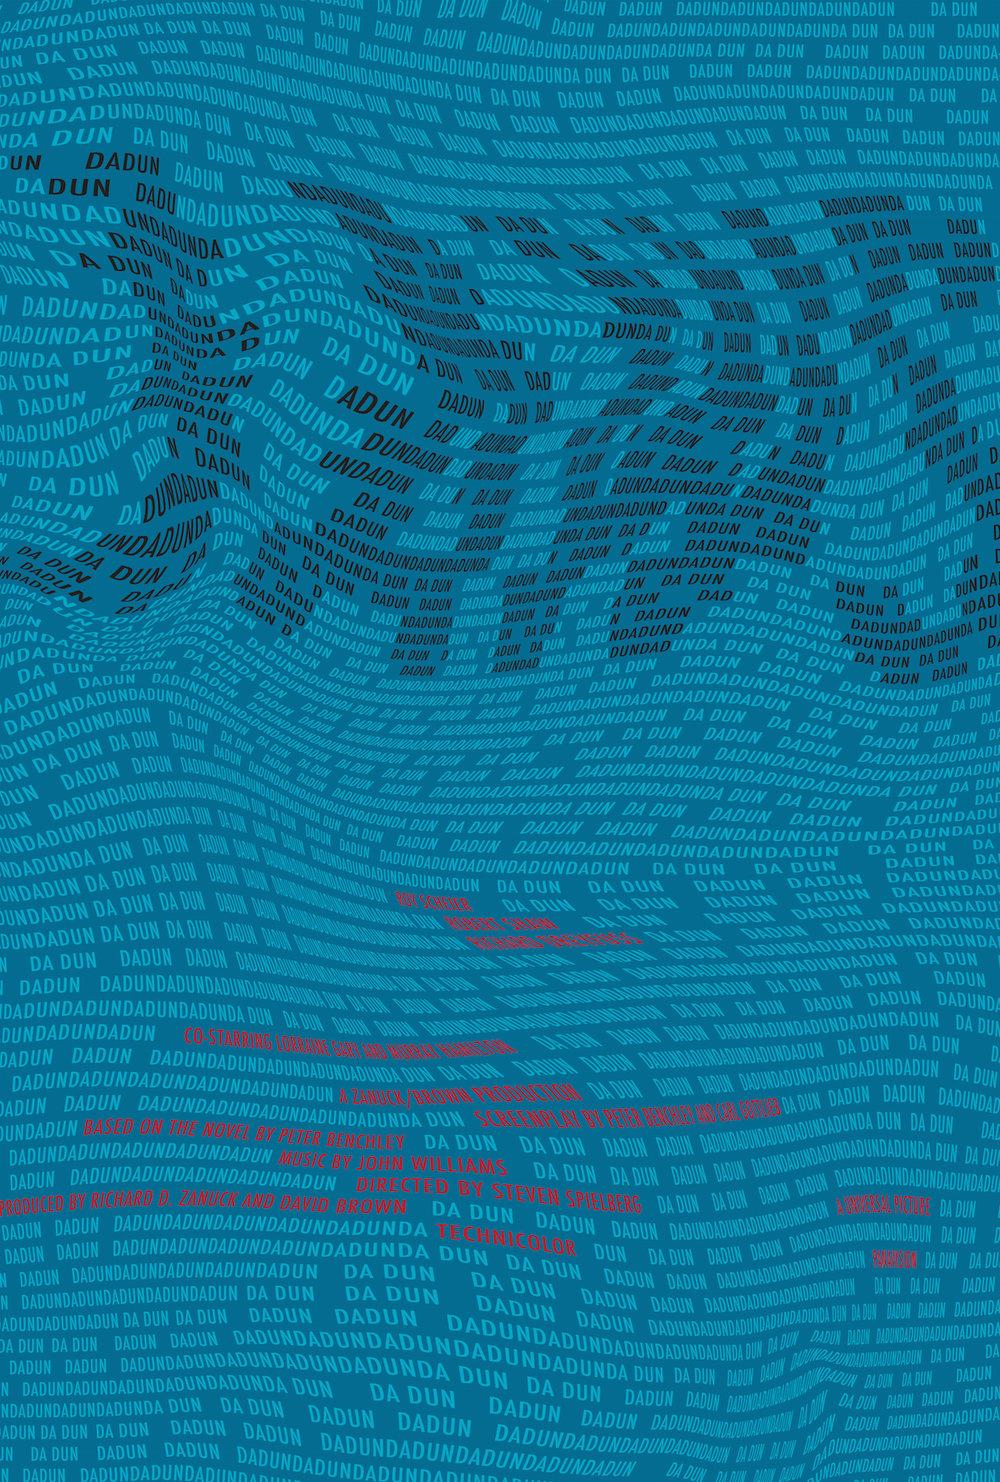 JAWS movie poster 2.jpg